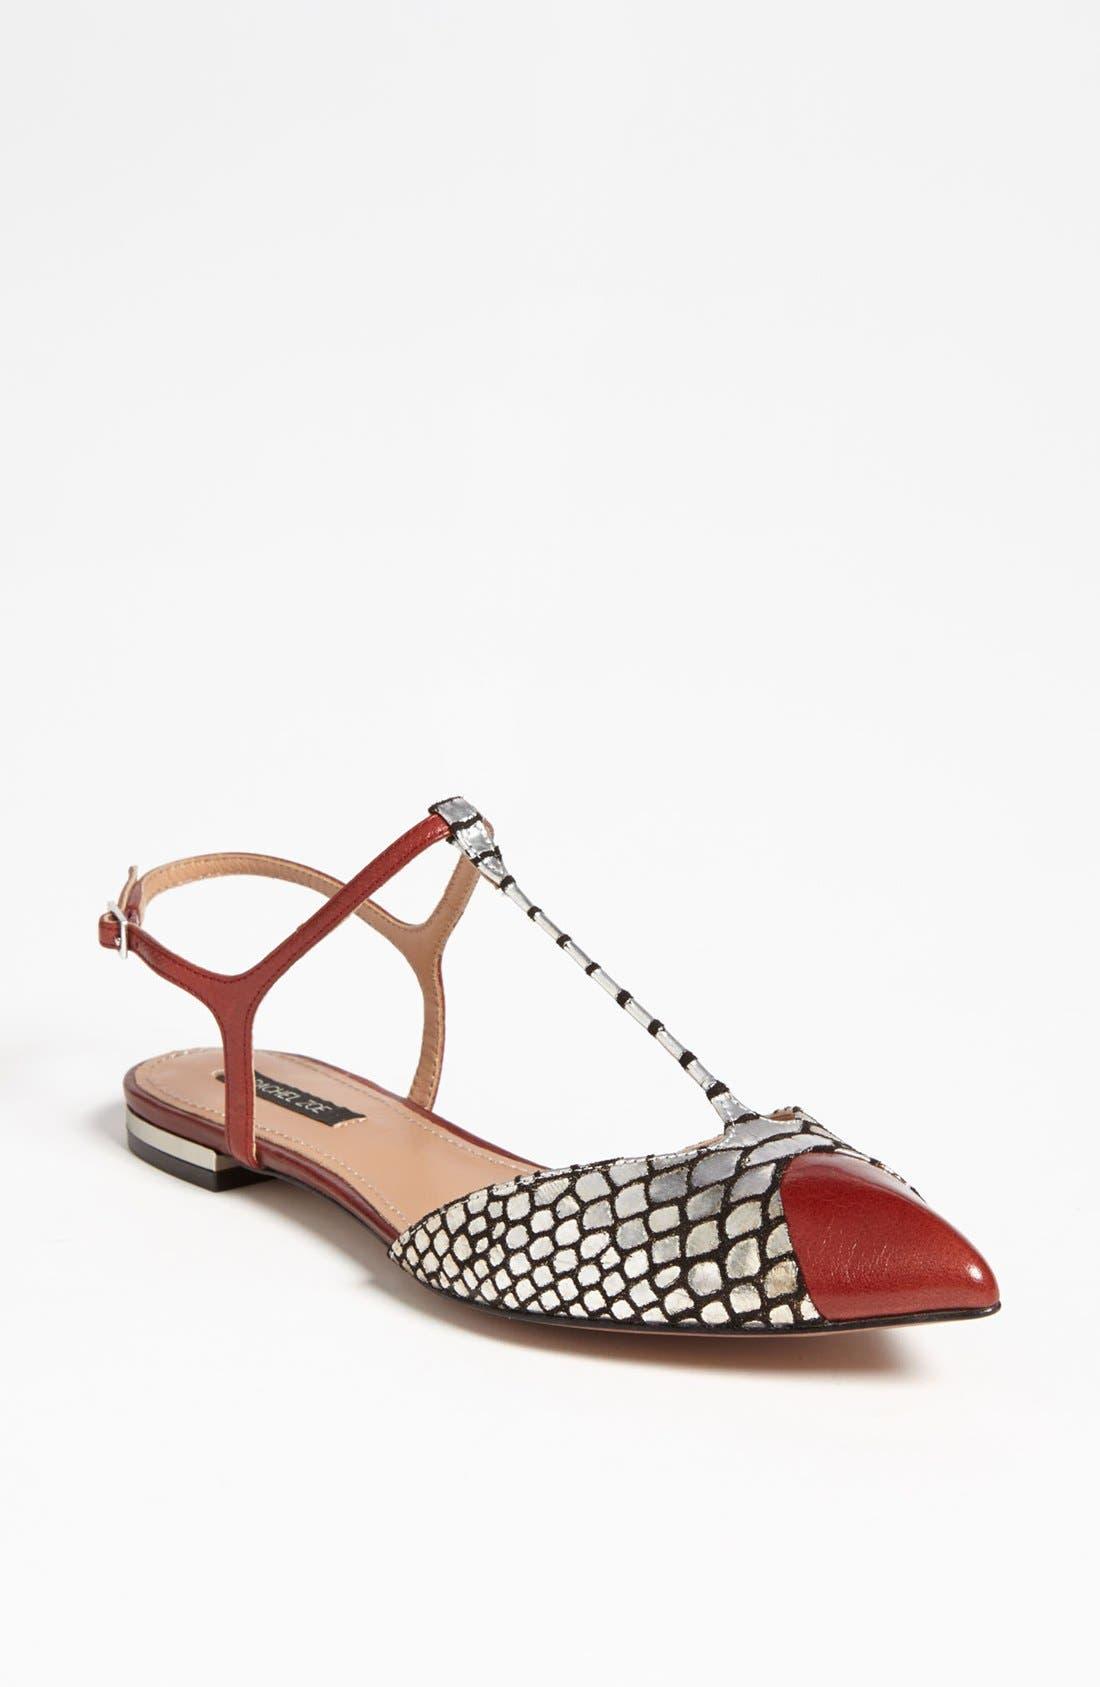 Alternate Image 1 Selected - Rachel Zoe 'Isabel' Sandal